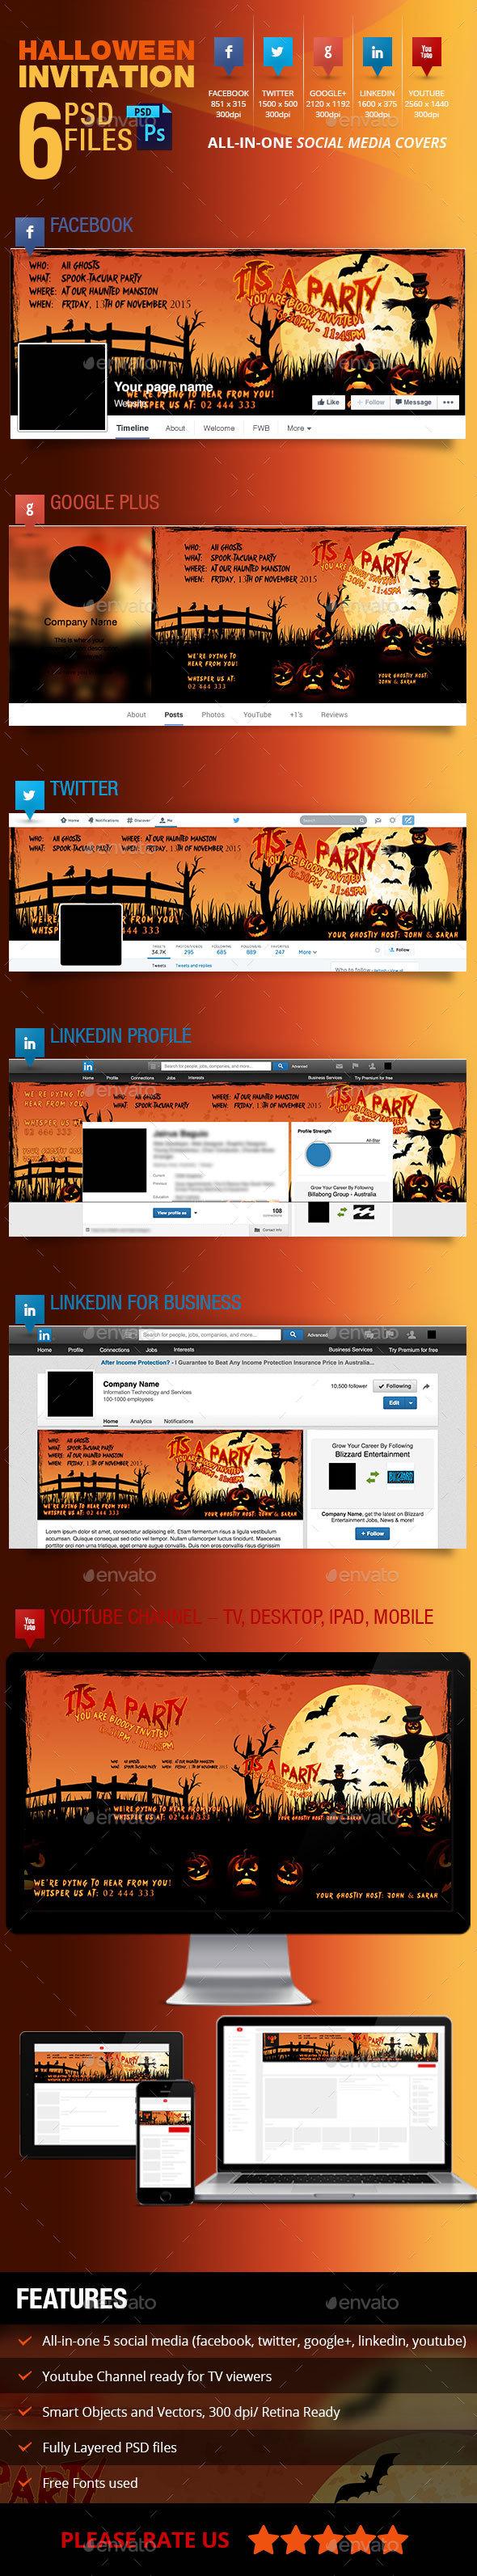 Halloween Party Invitation Social Media Cover - Social Media Web Elements